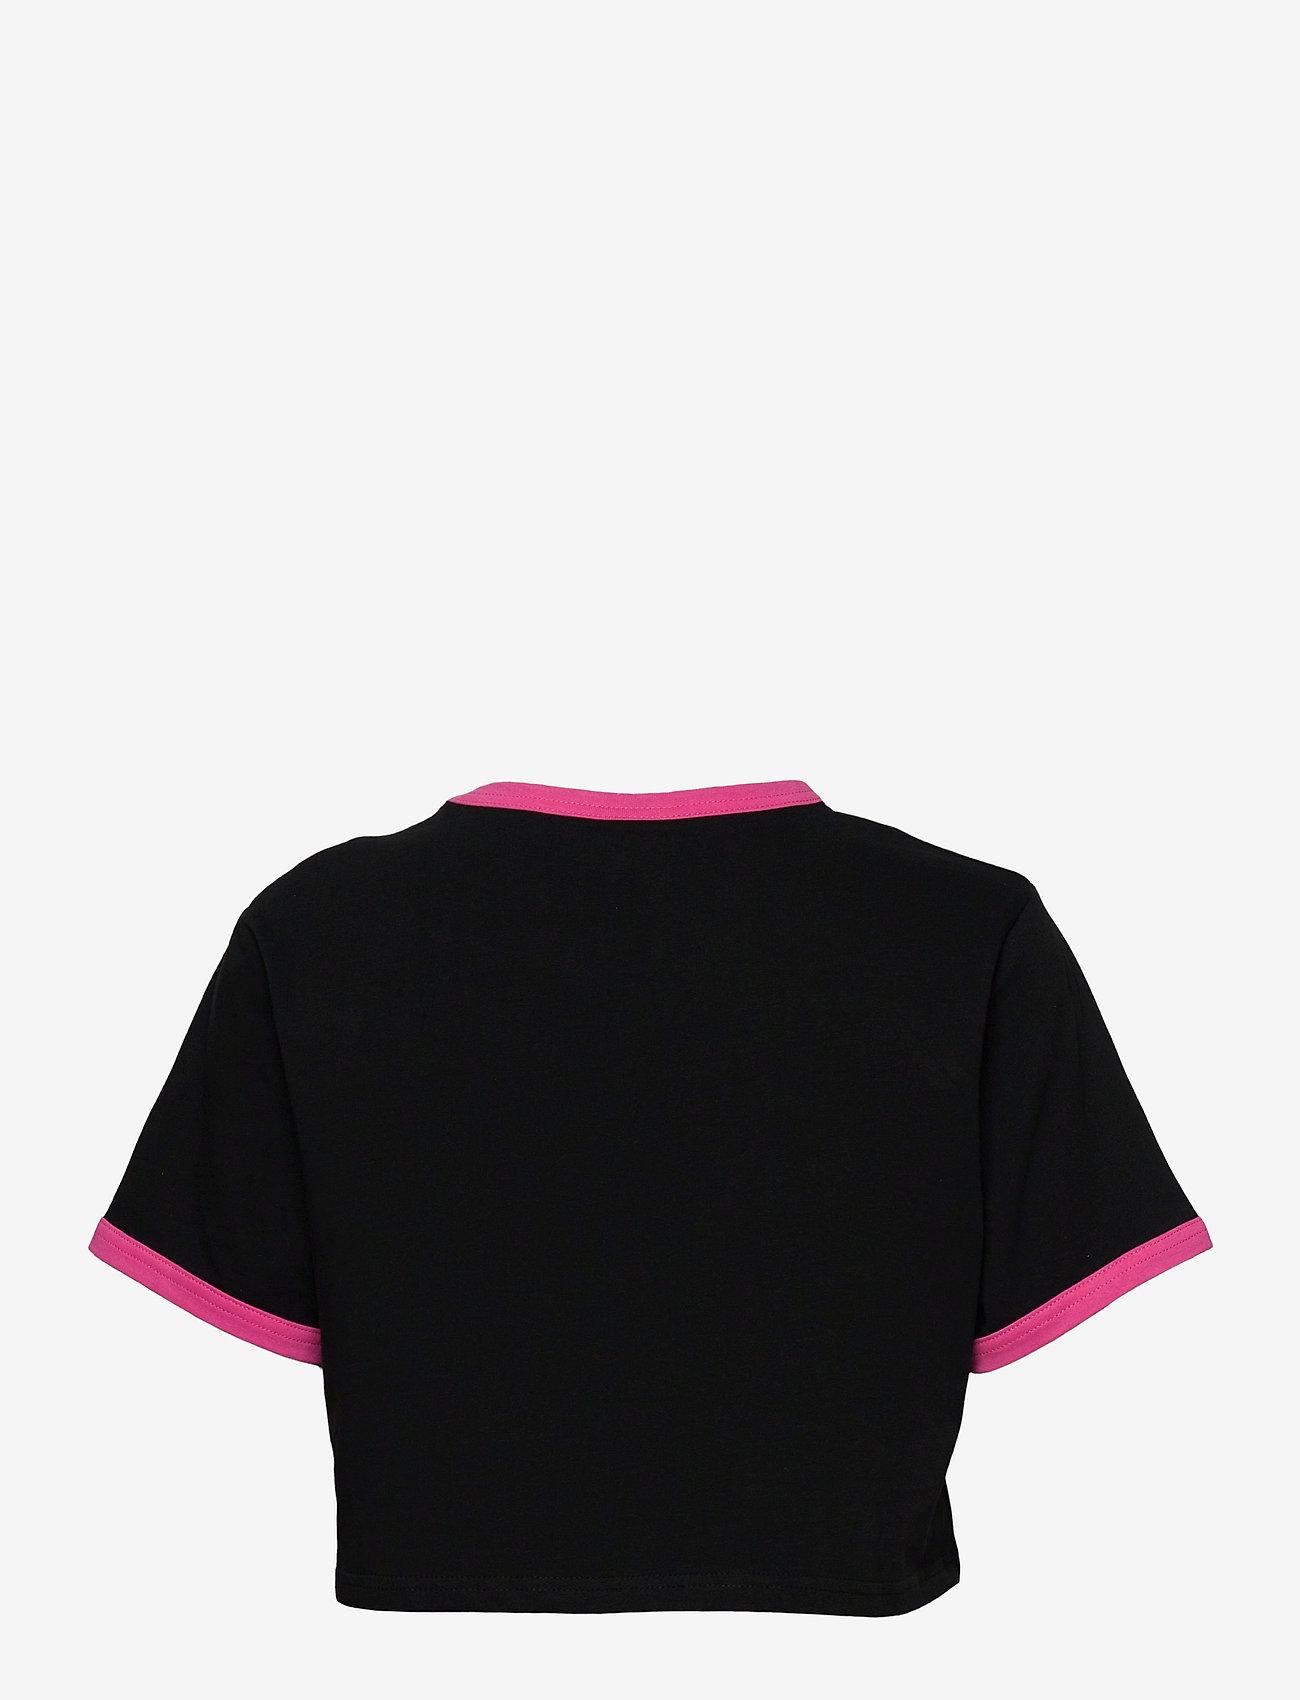 Ellesse - EL FILIDE CROP T-SHIRT - crop tops - black - 1